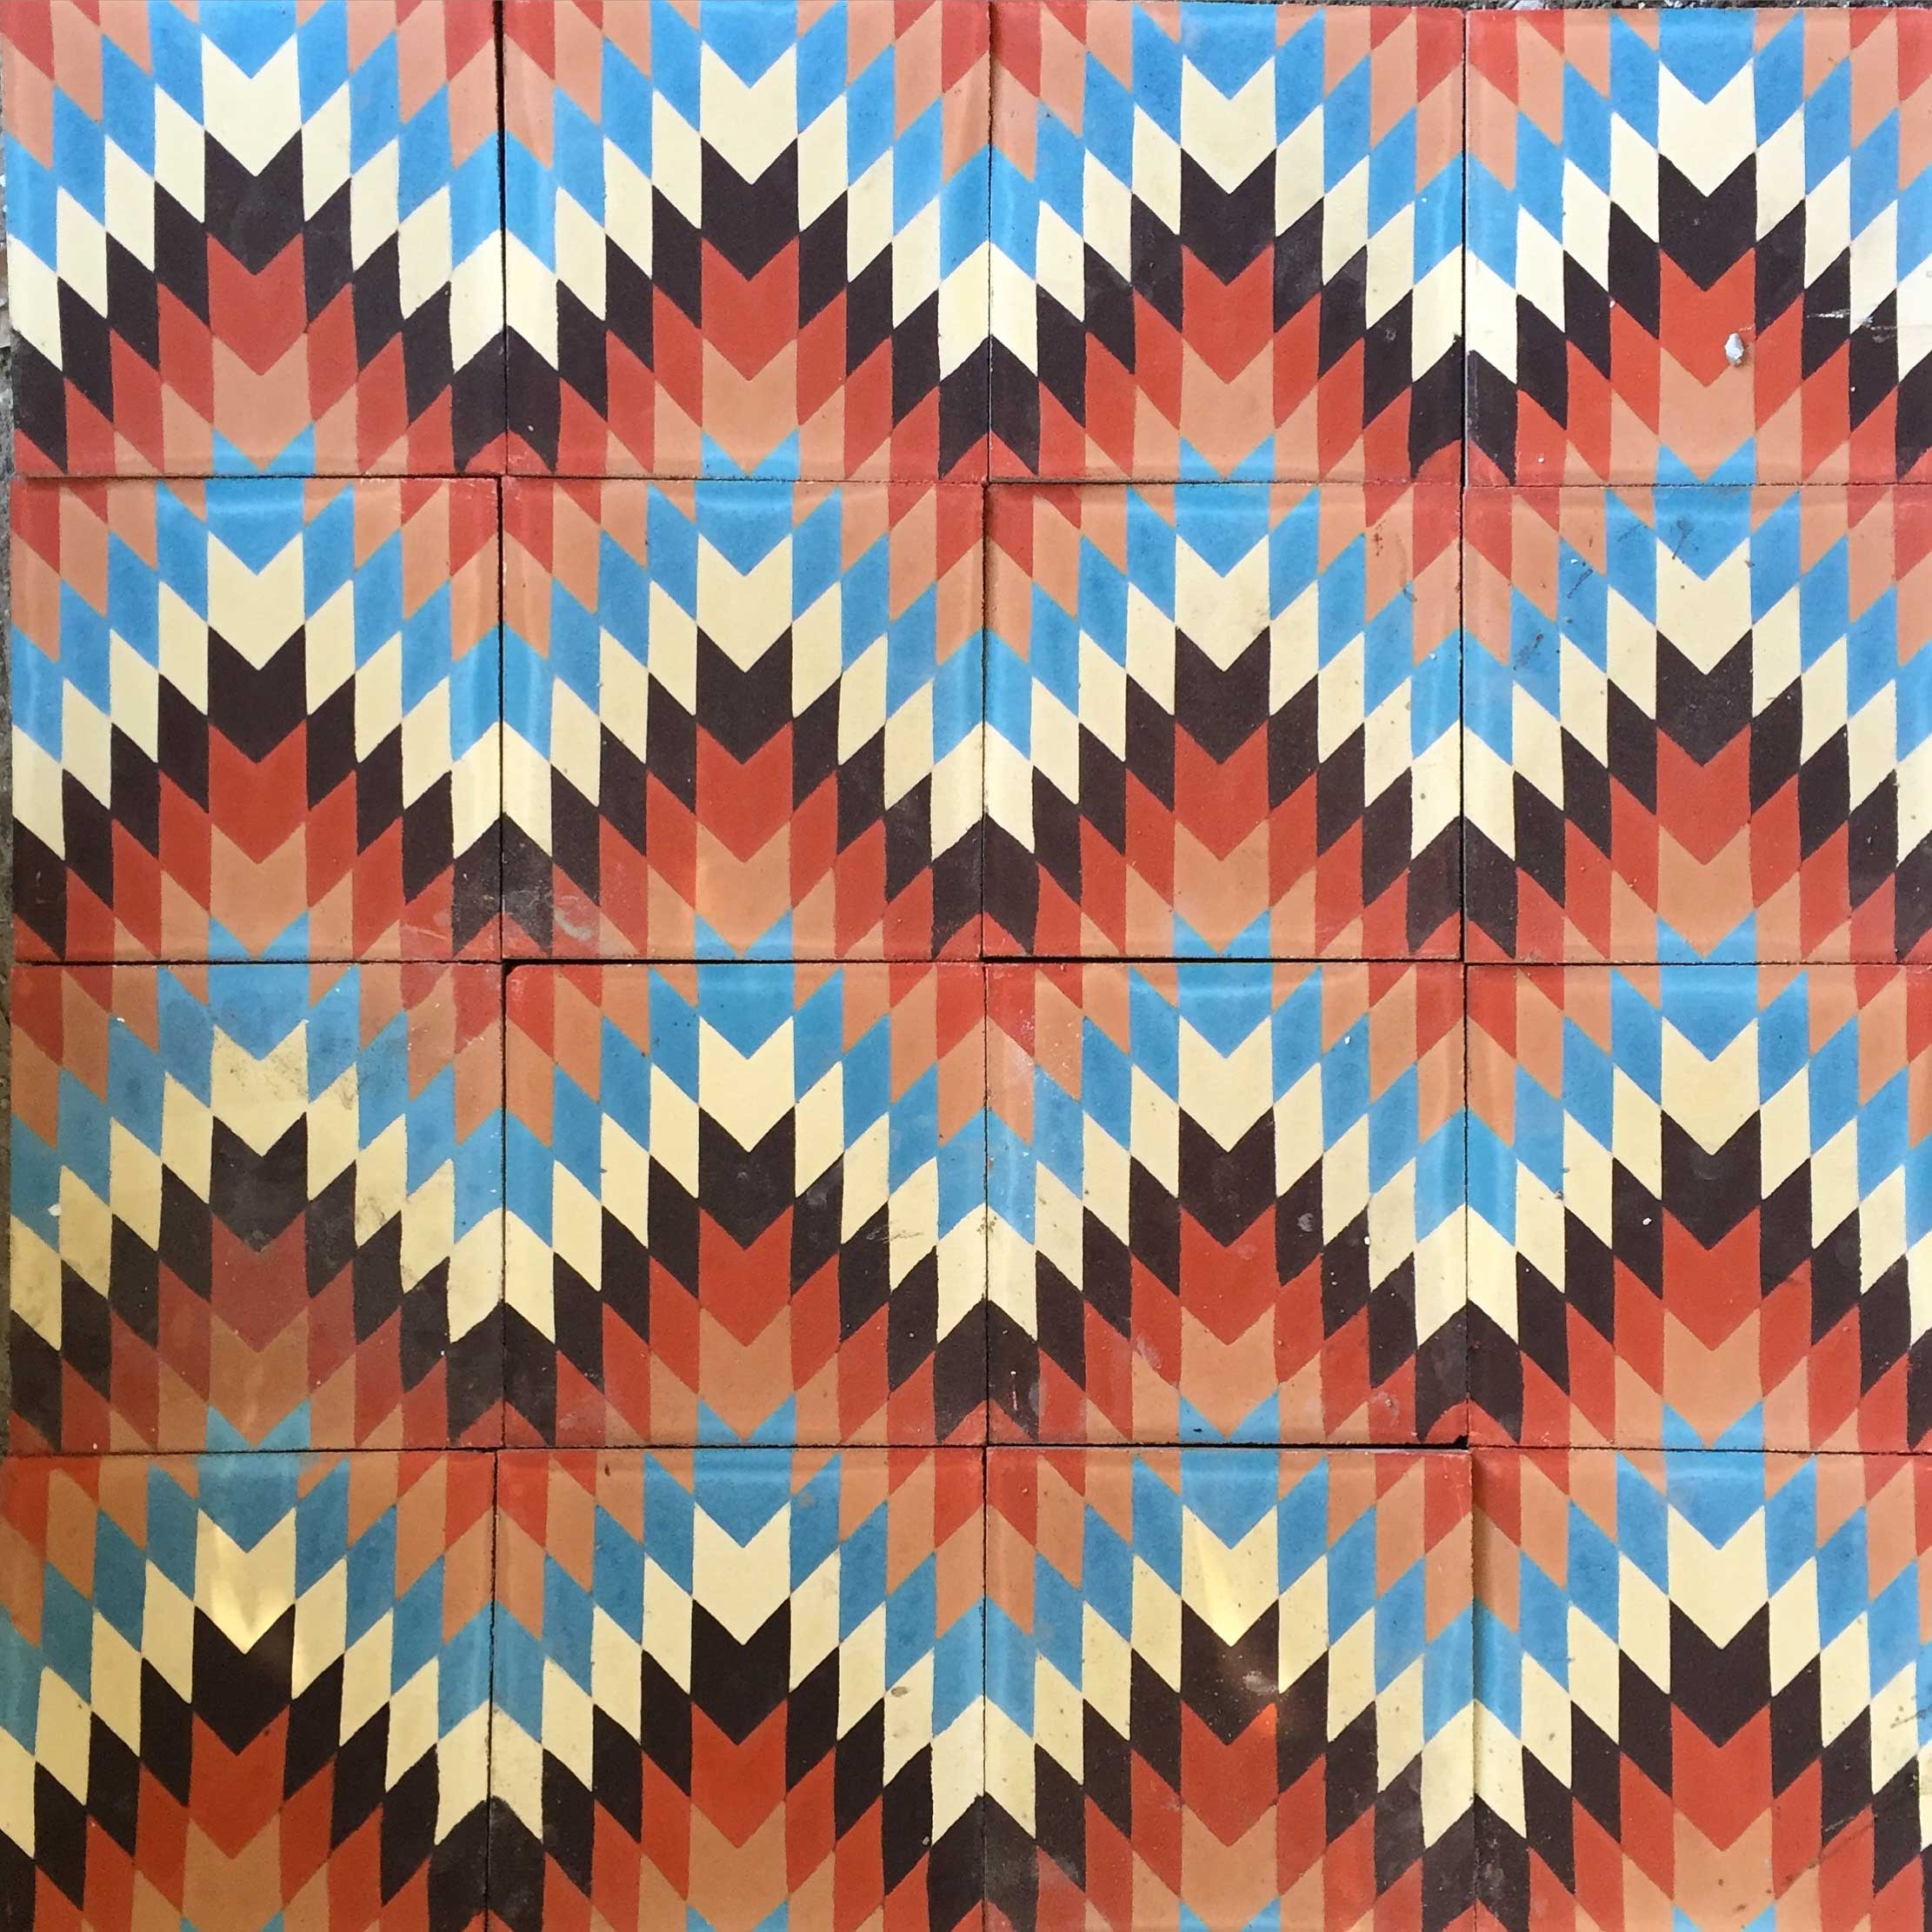 Mosaico tribal